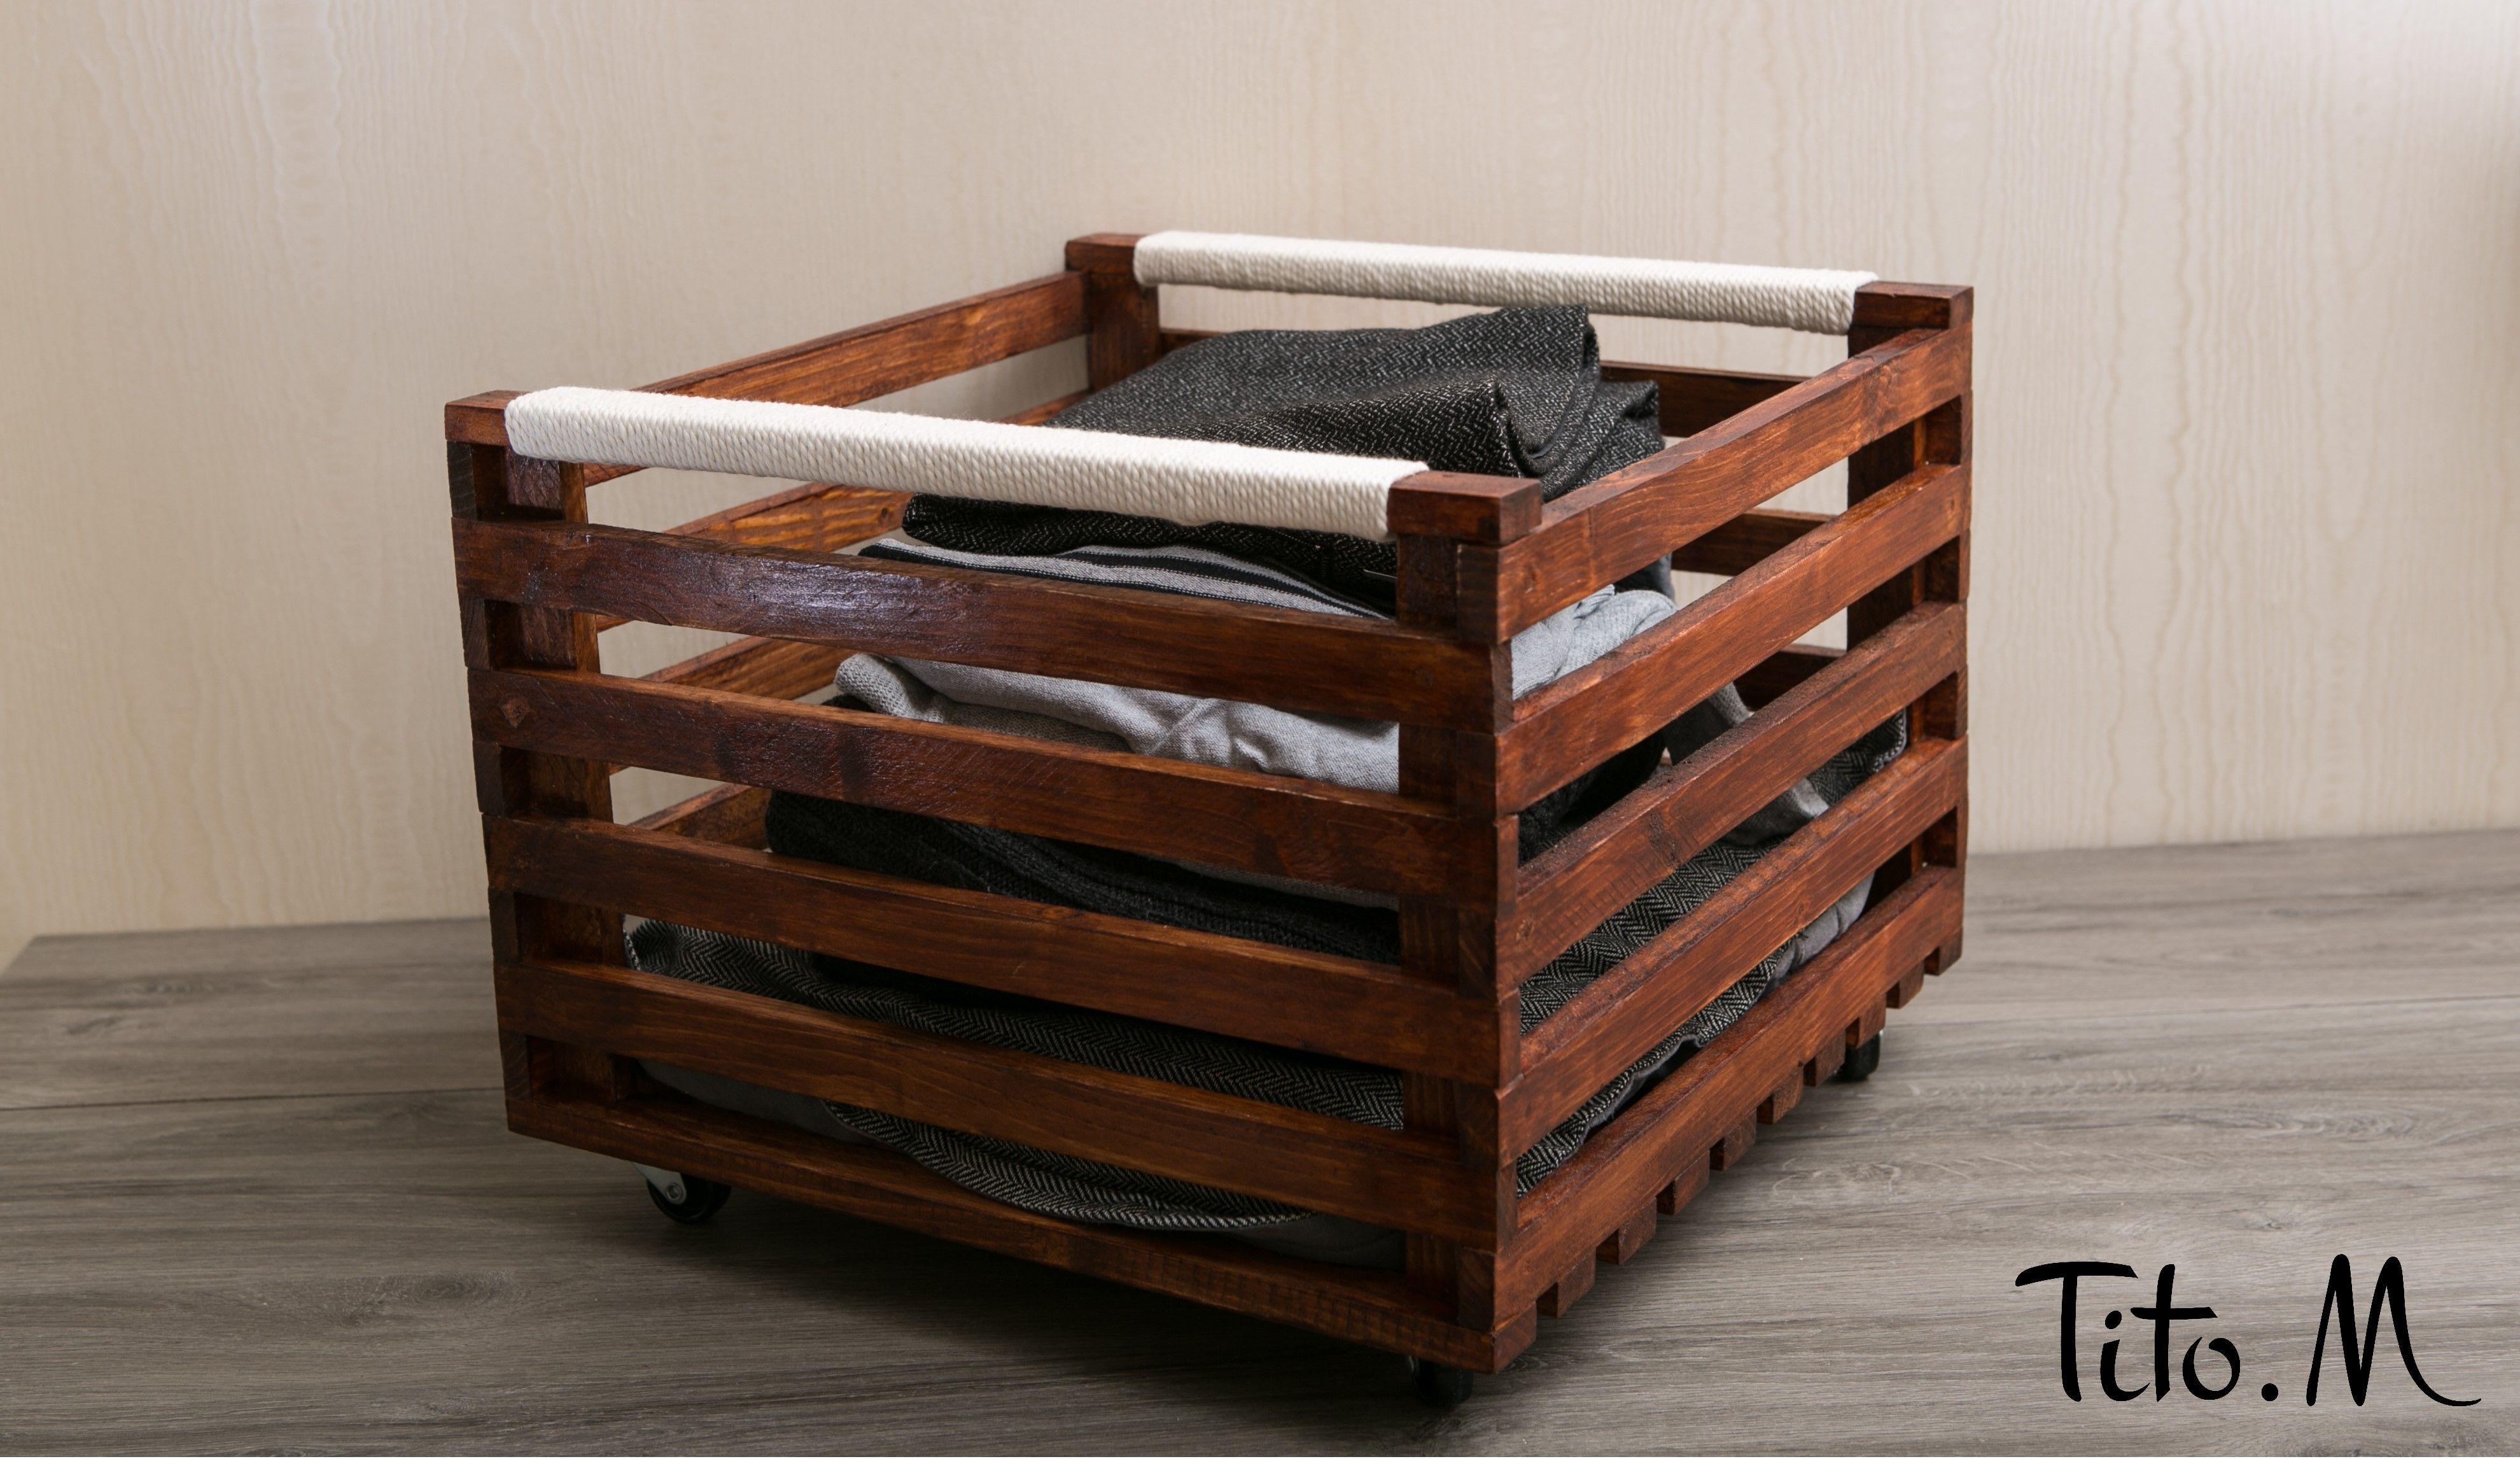 Caisse de rangement | Caisse rangement, Rangement bois, Rangement